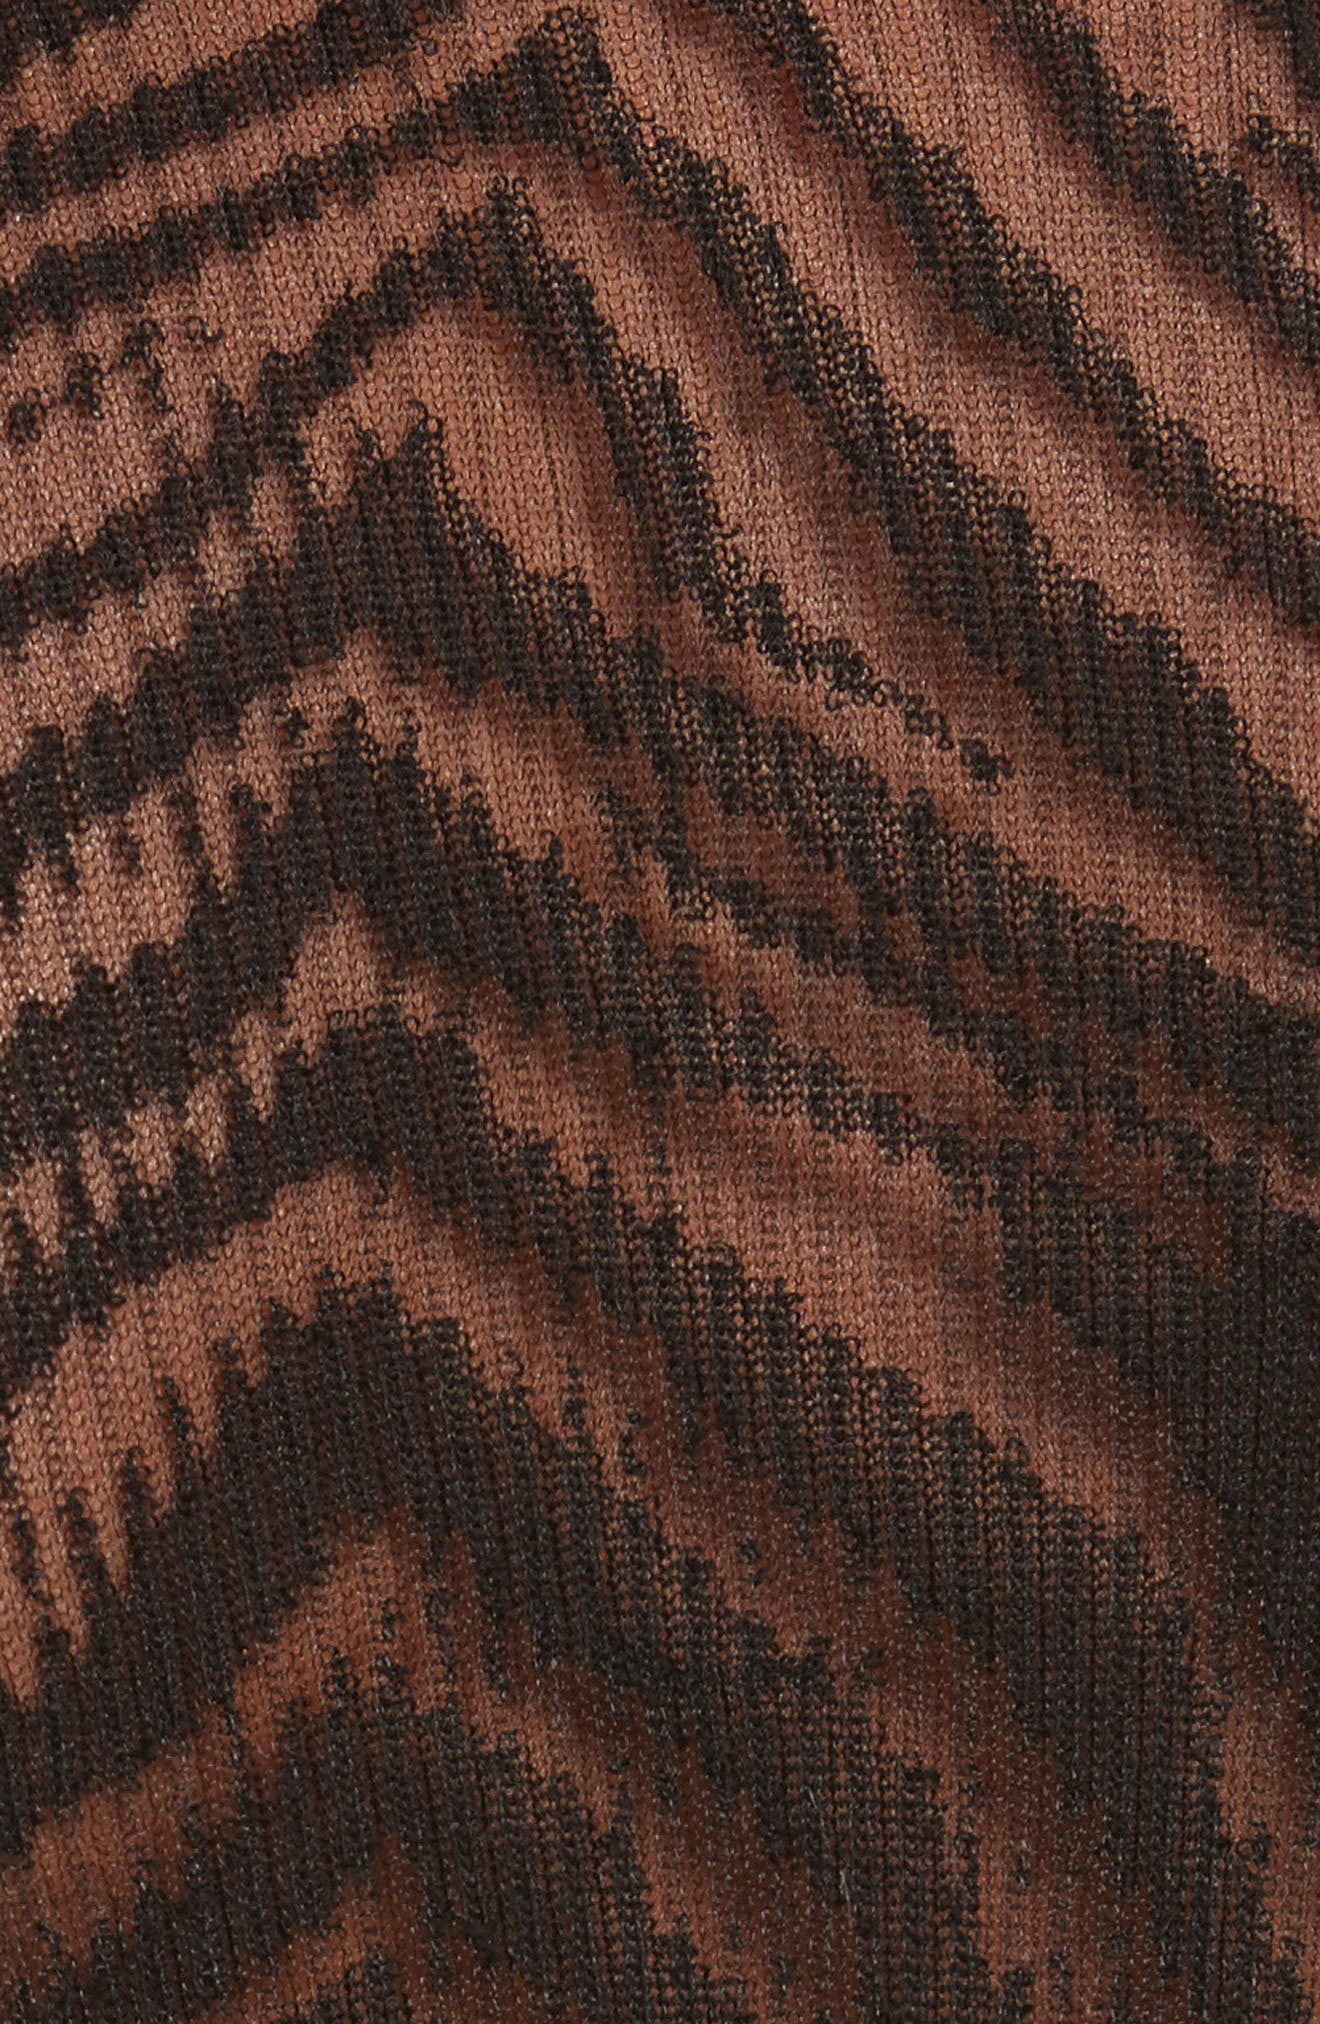 Zebra Knit Pullover,                             Alternate thumbnail 5, color,                             001